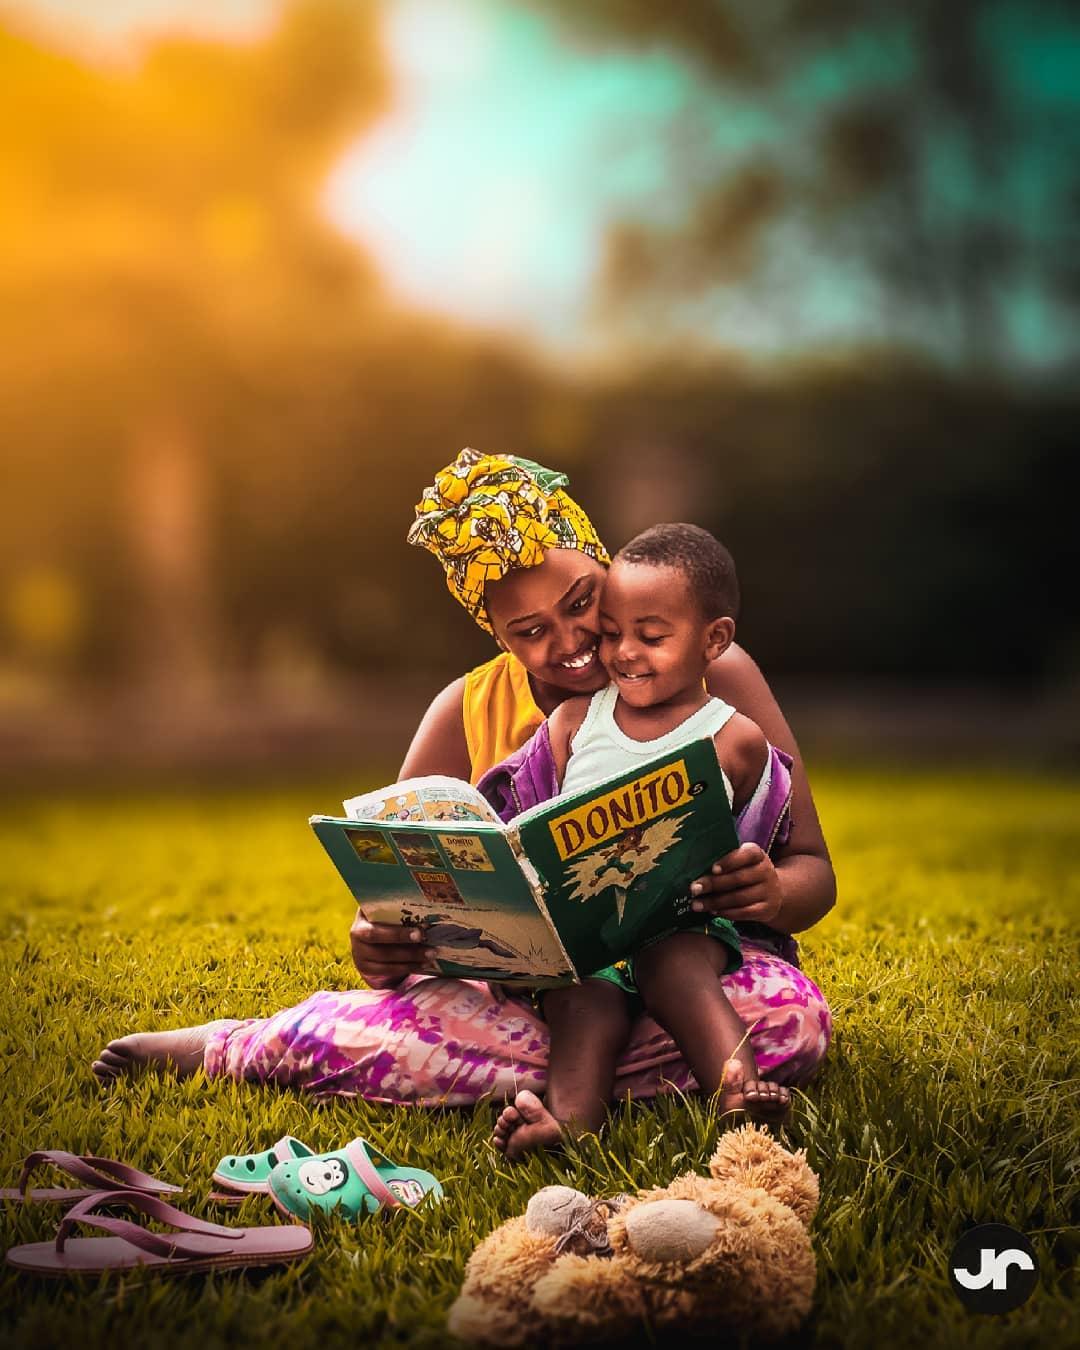 essential life skills to teach kids